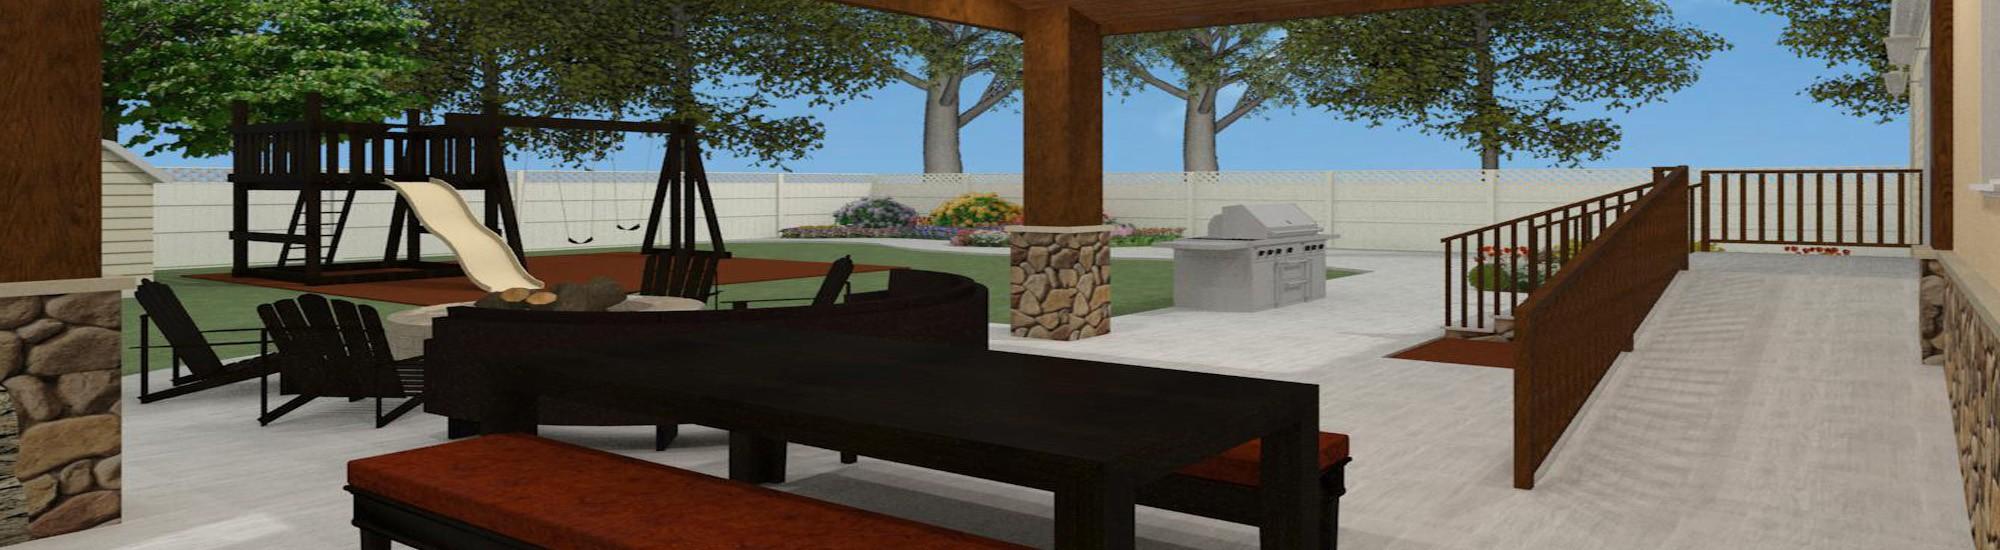 Design Build Pros Outdoor Living Space (1)